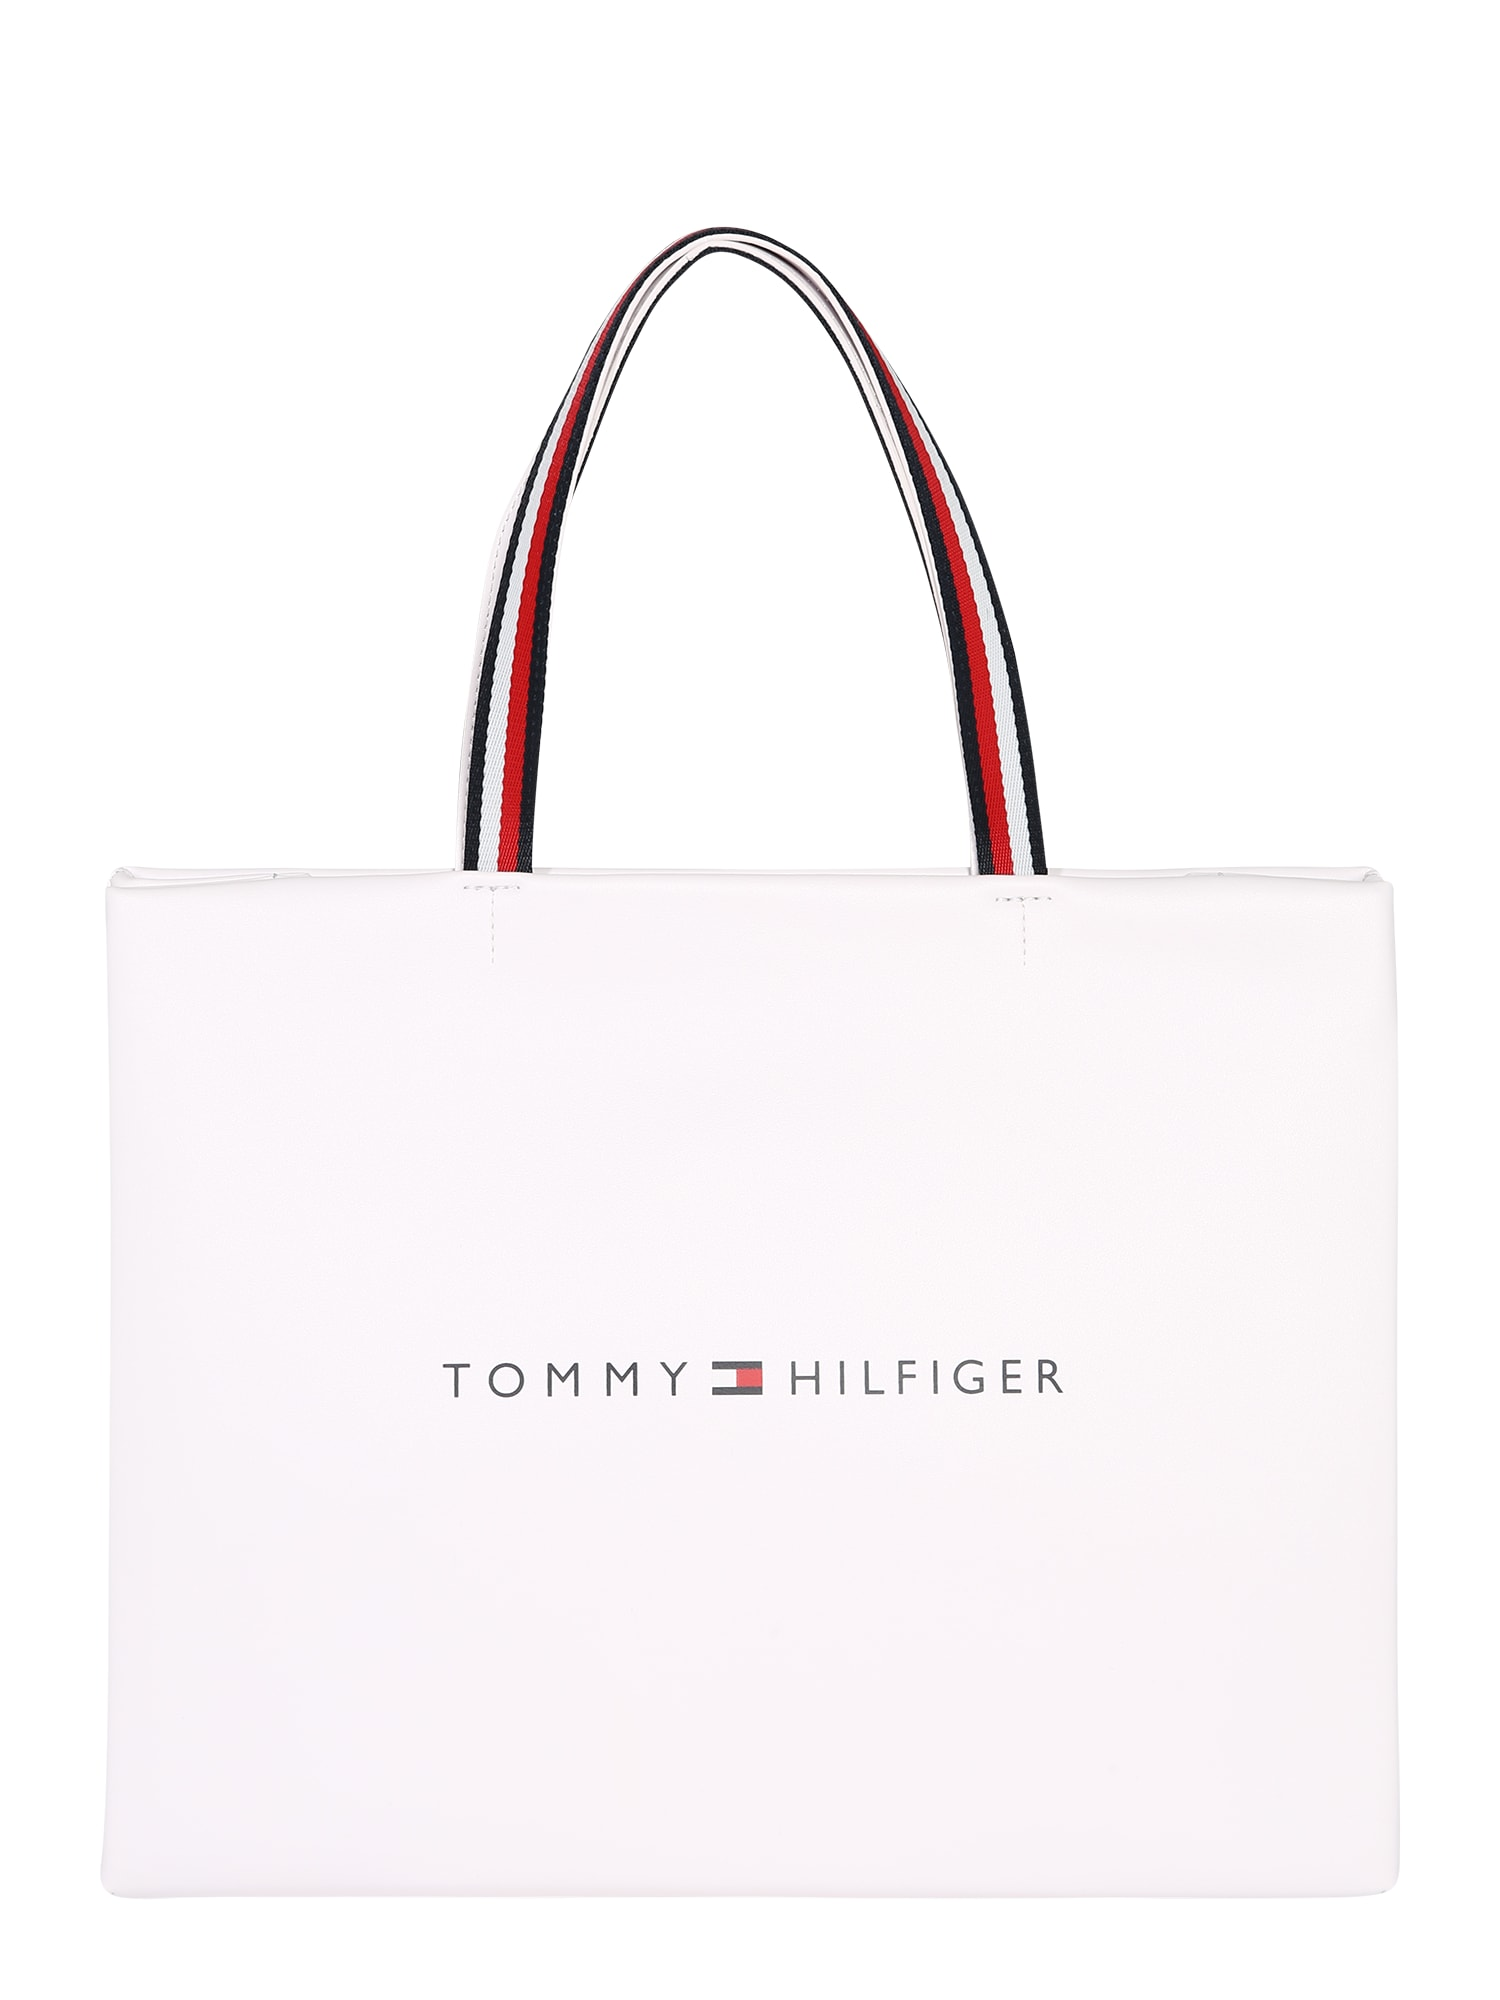 TOMMY HILFIGER Pirkinių krepšys balta